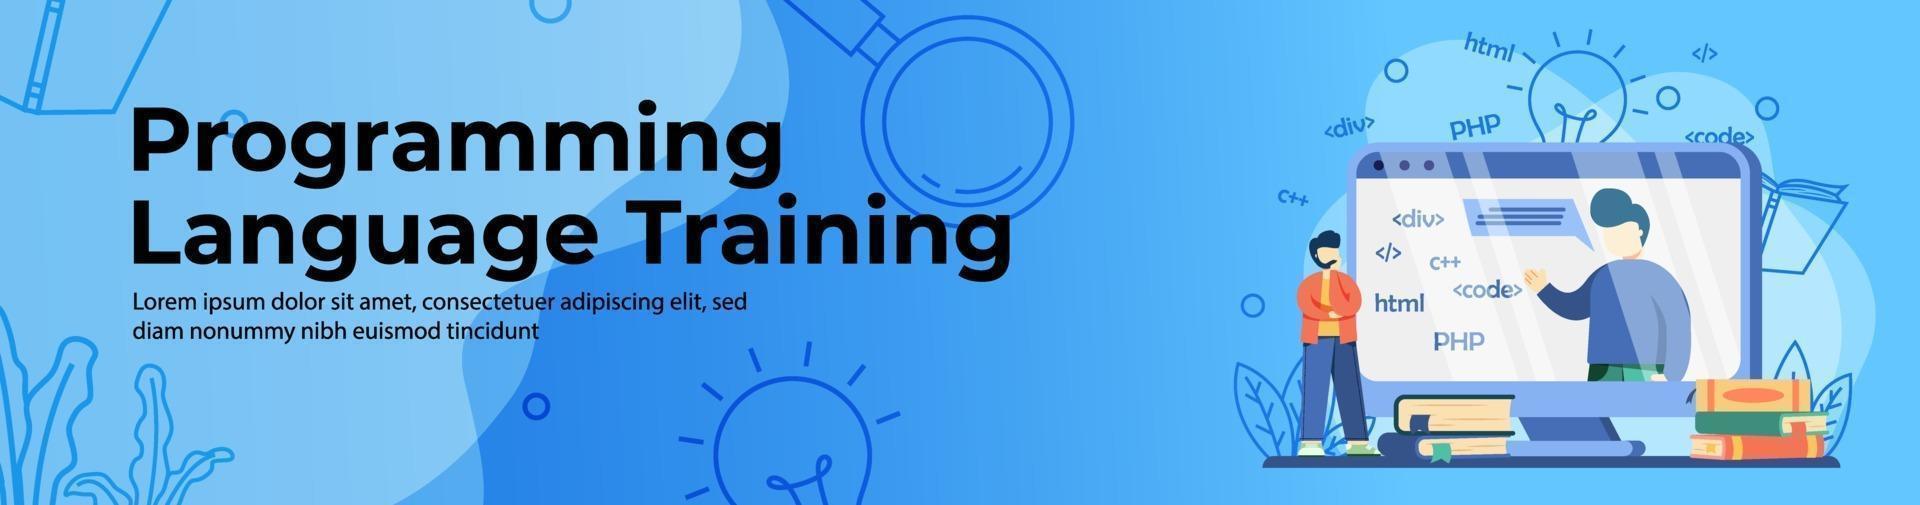 Programming language training Web Banner vector